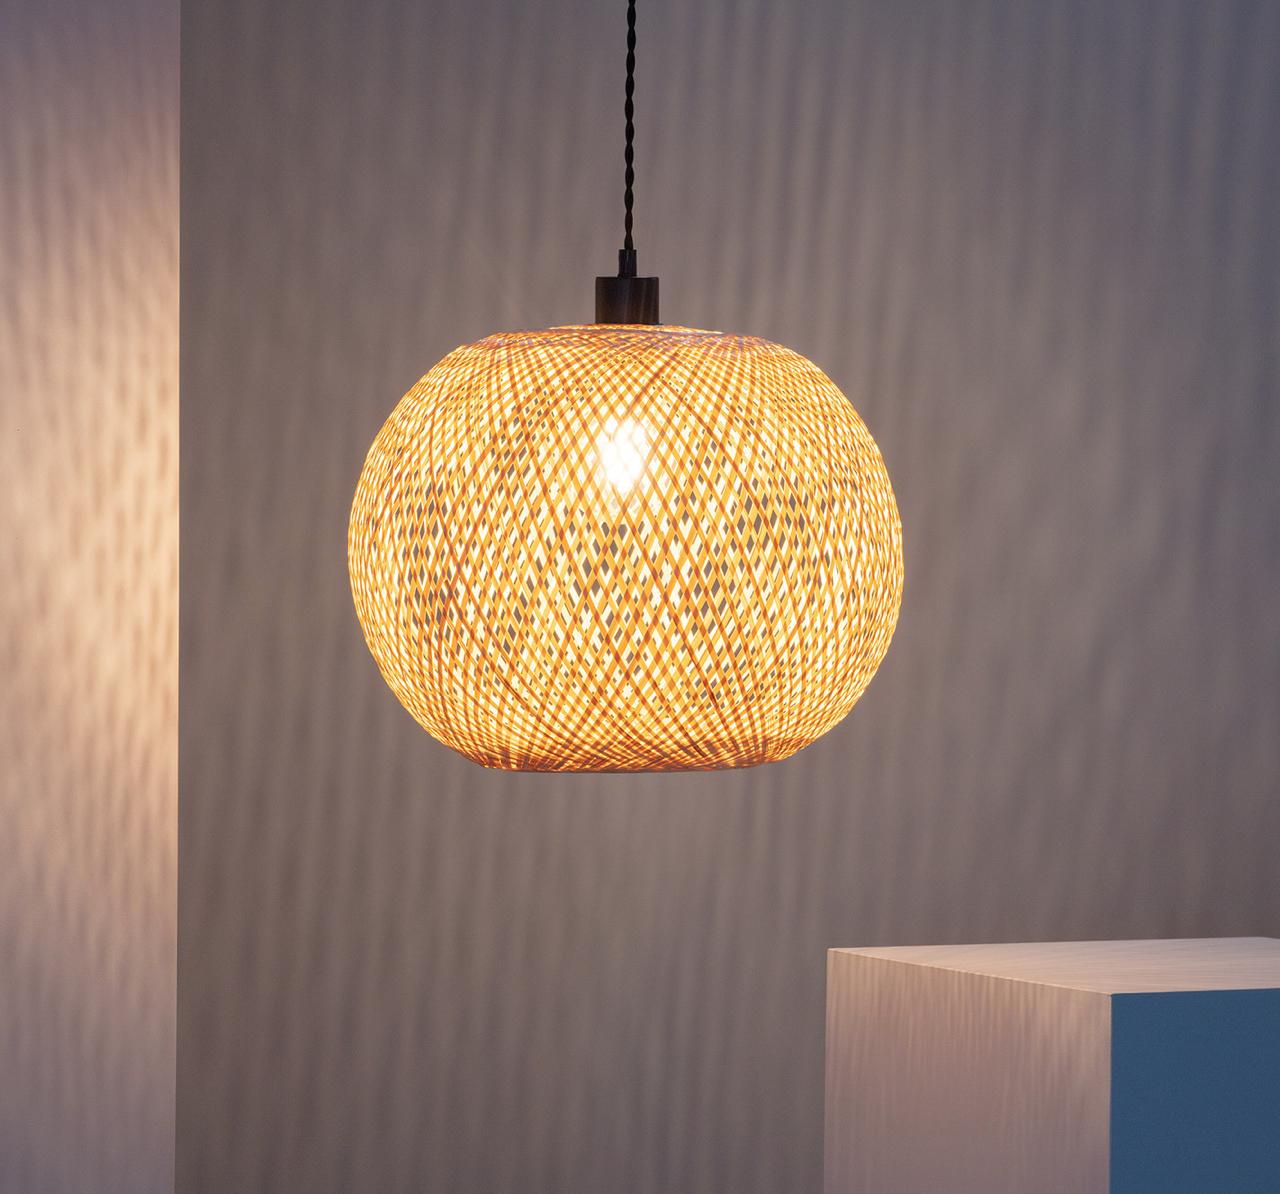 Bambusowa Lampa wisząca pleciona E27 naturalna Boho